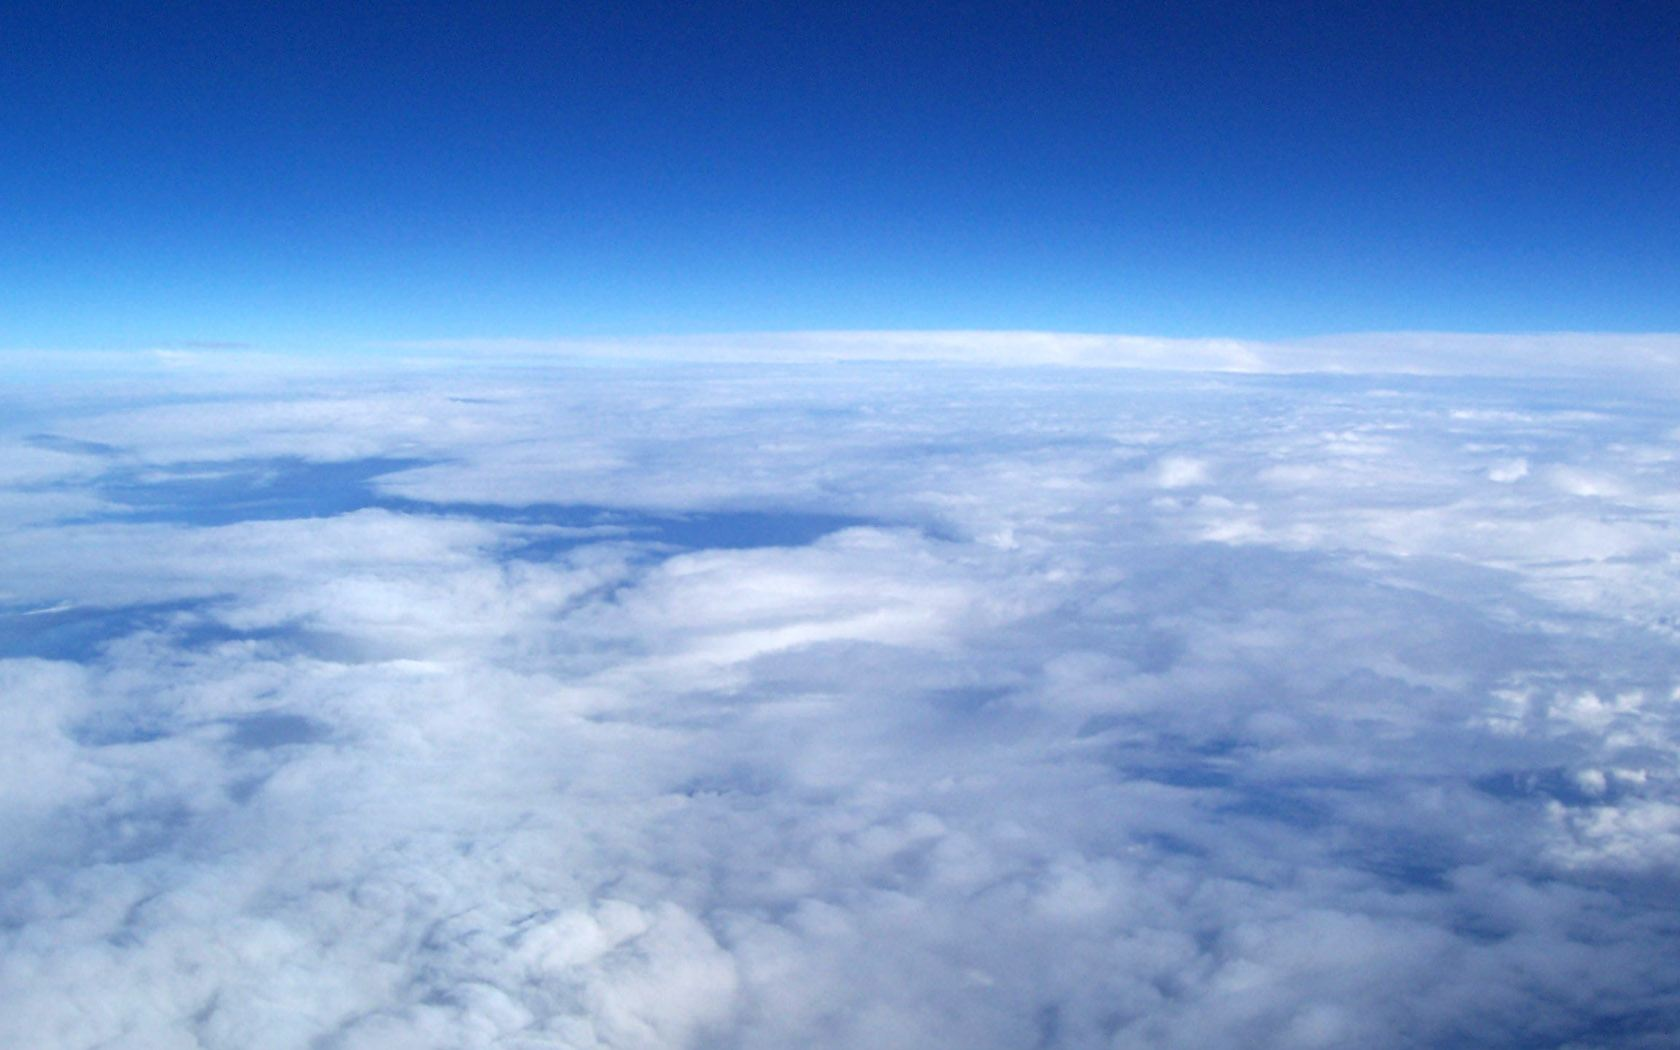 Clouds Wallpaper 065